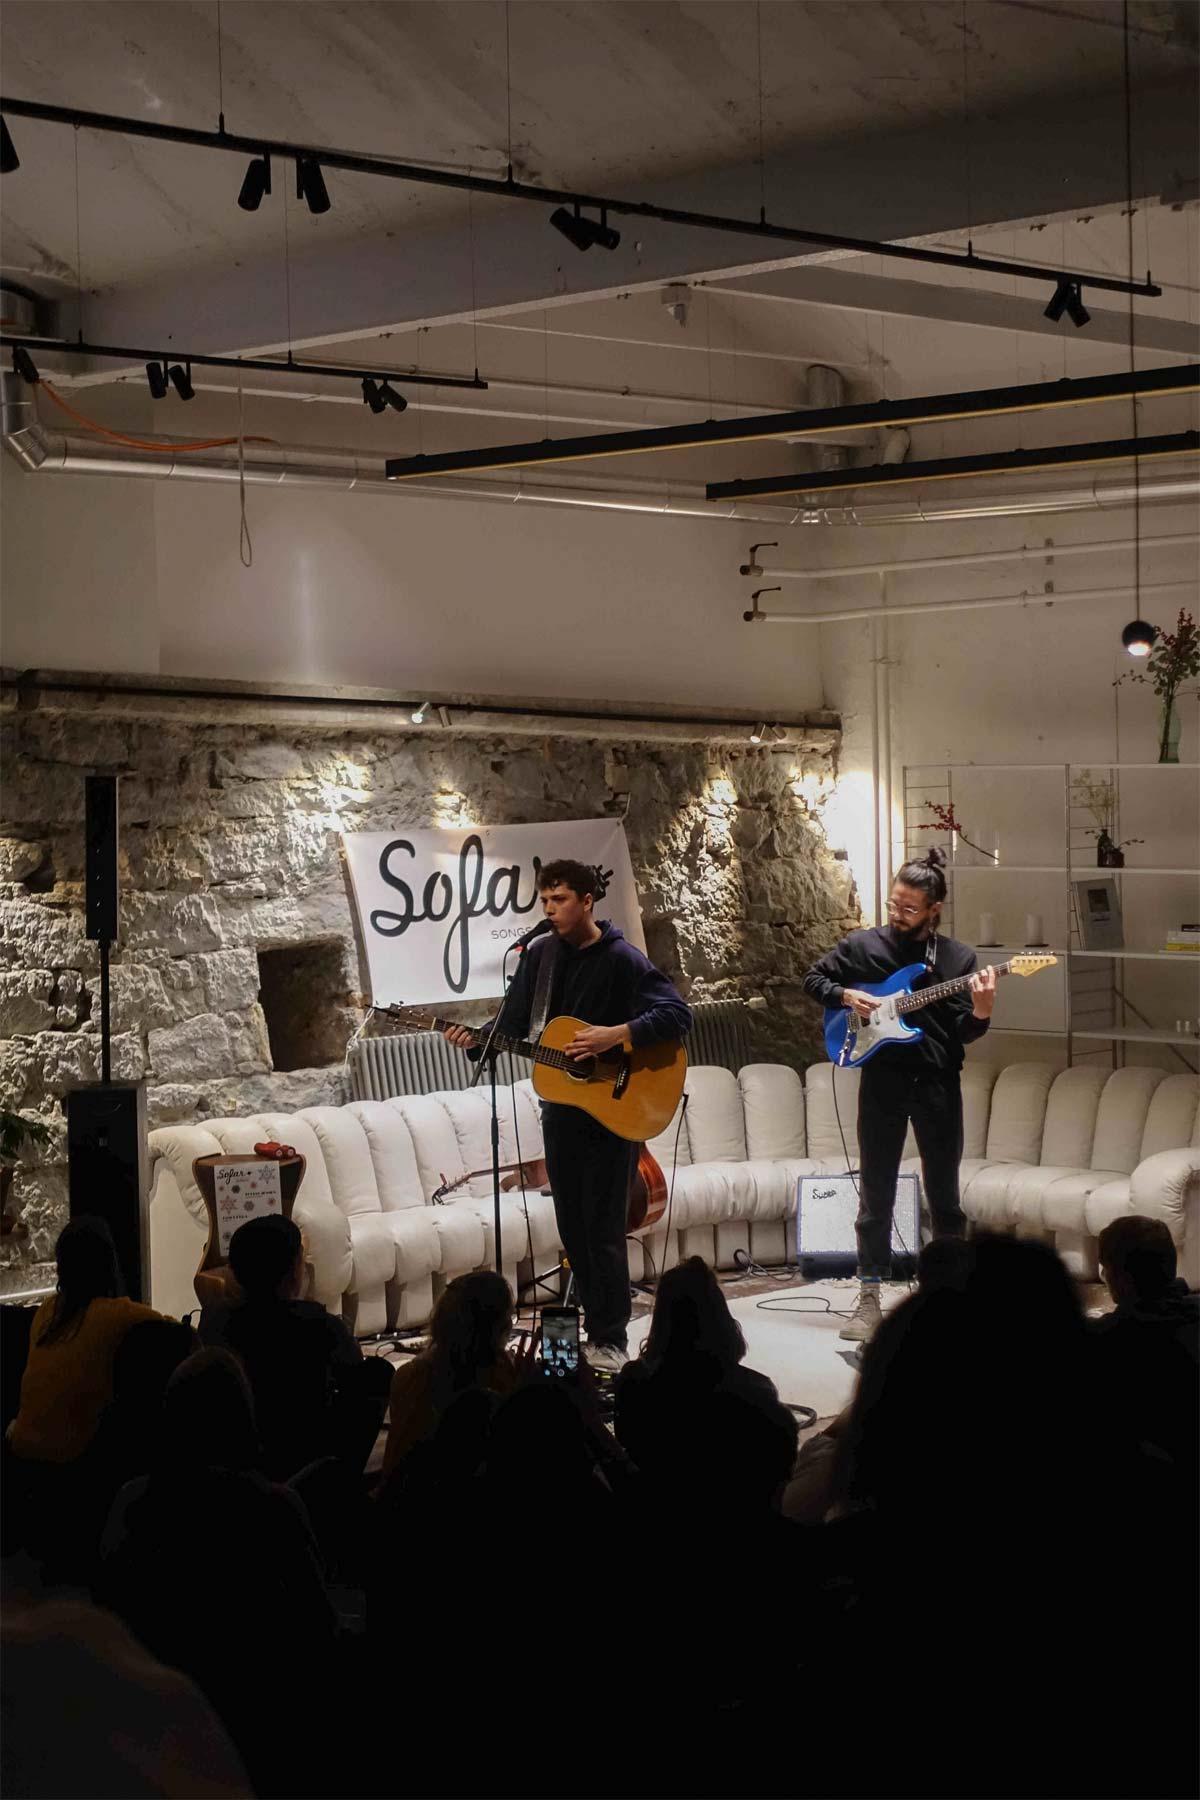 Sofar concert in front of de Sede ds600 couch in VN Residency